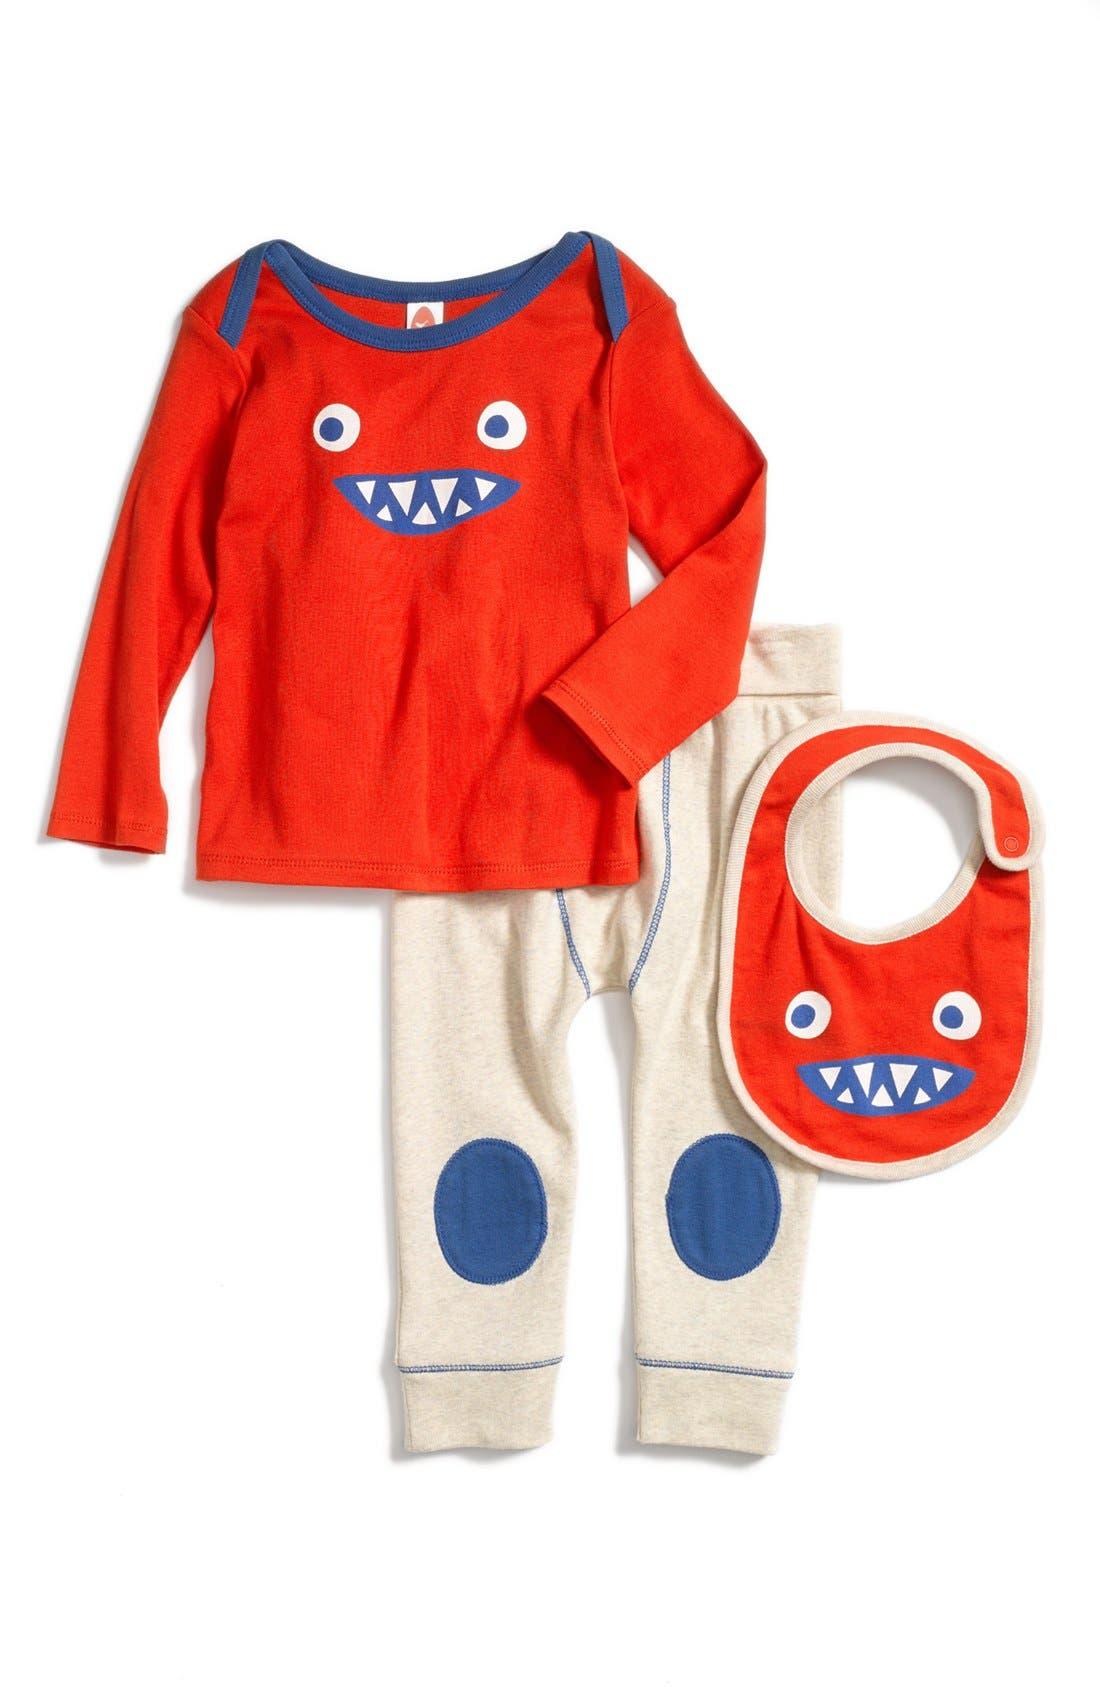 Main Image - Stem Baby Organic Cotton Shirt, Pants & Bib (Baby Boys)